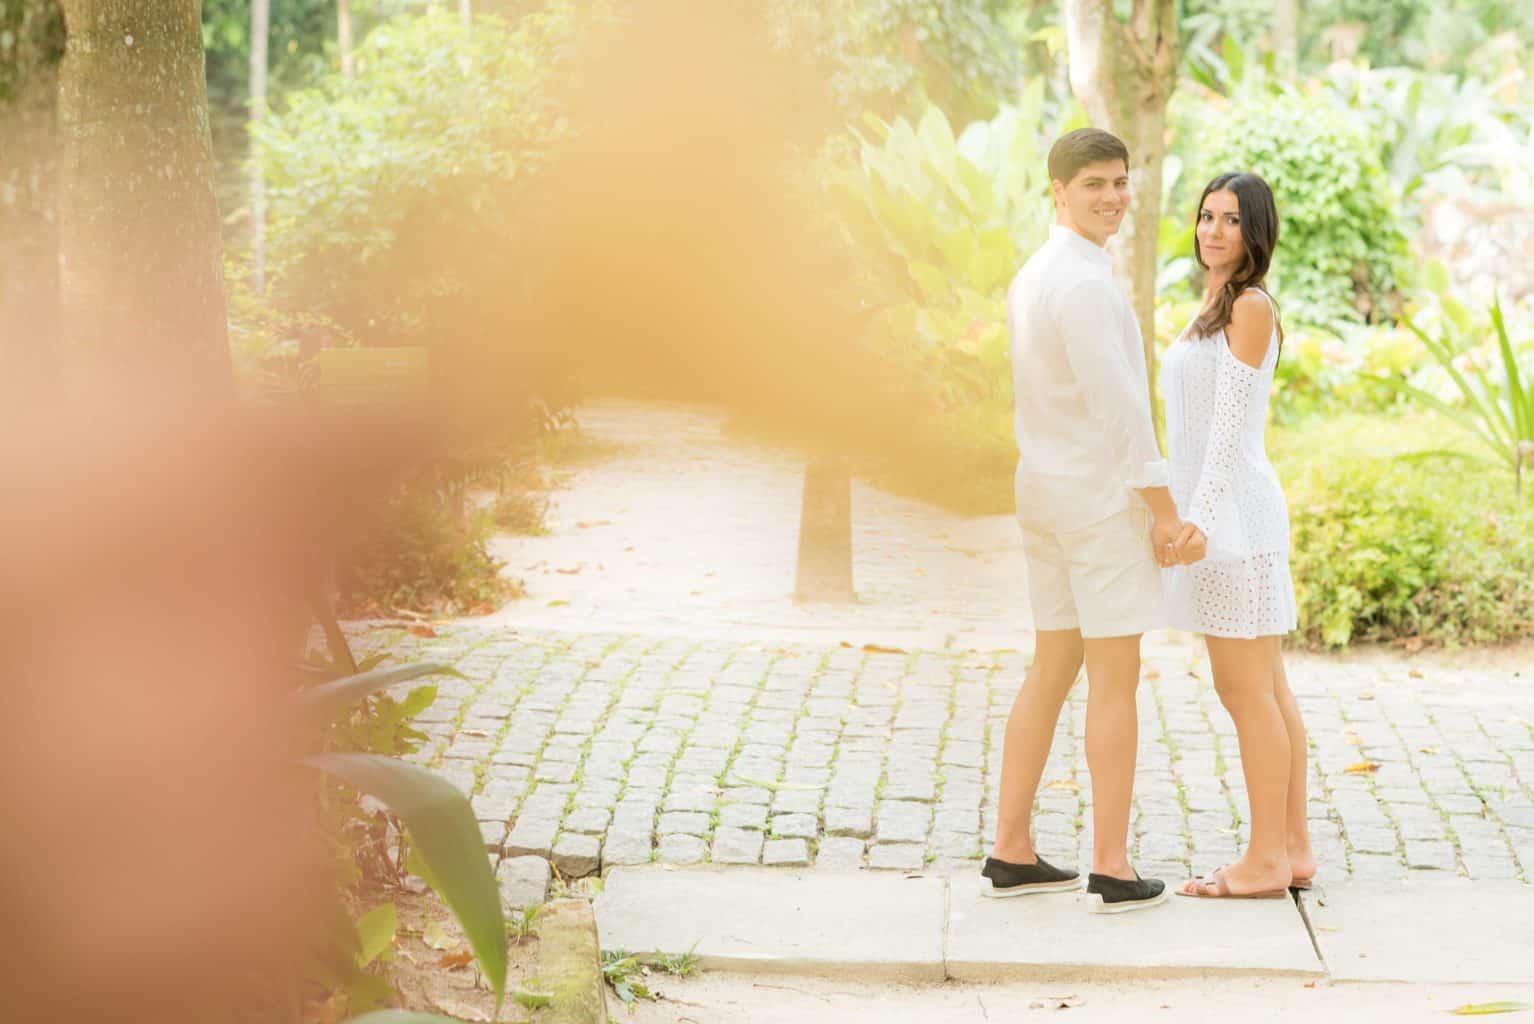 Pre-Wedding-Tamara-e-Rodrigo-Ensaio-fotográfico-Marina-Fava-Poses-CaseMe7009-x-4678